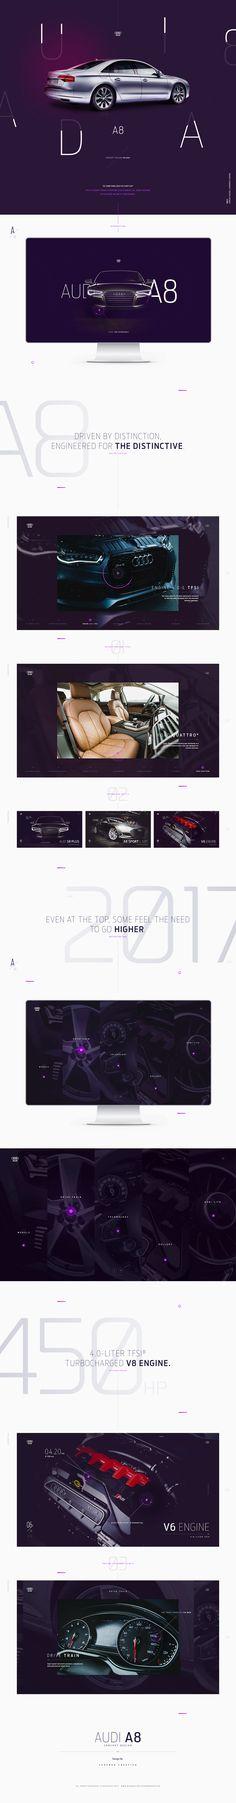 AUDI A8 - ConceptDesign on Behance